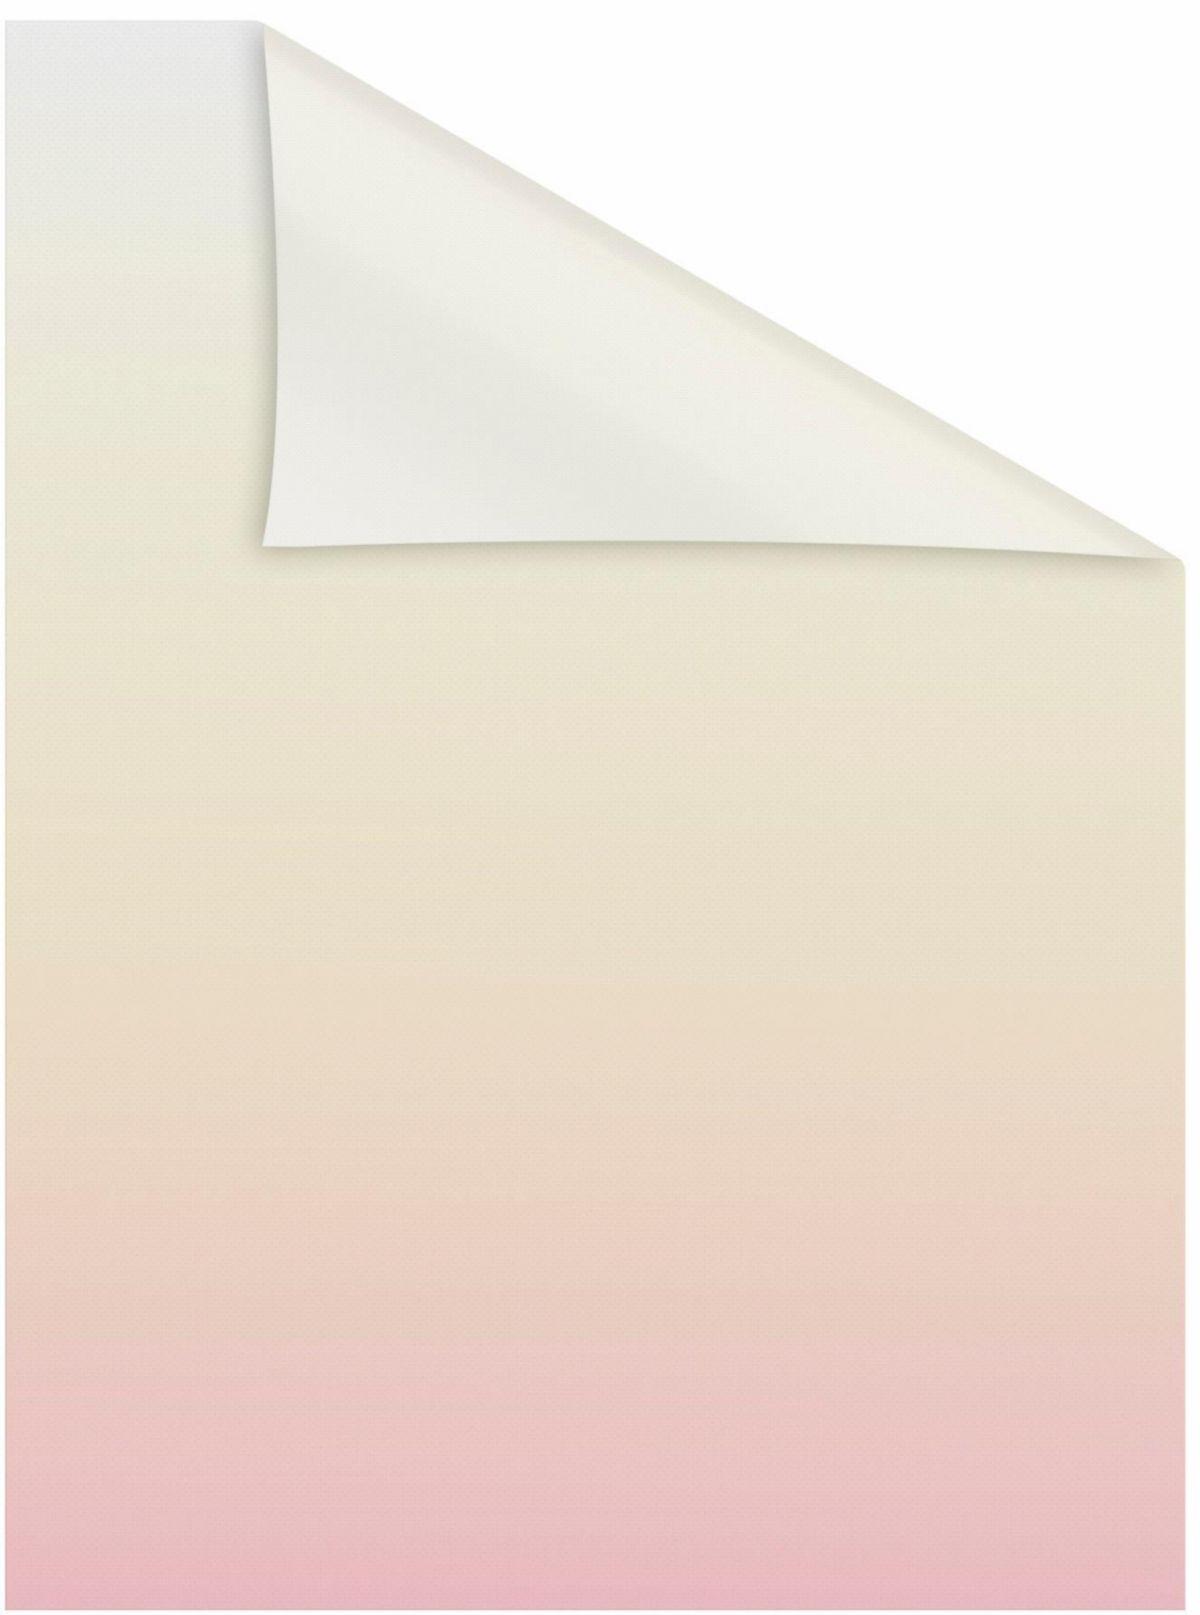 Fensterfolie, »Ombre Rosa«, LICHTBLICK, blickdi...